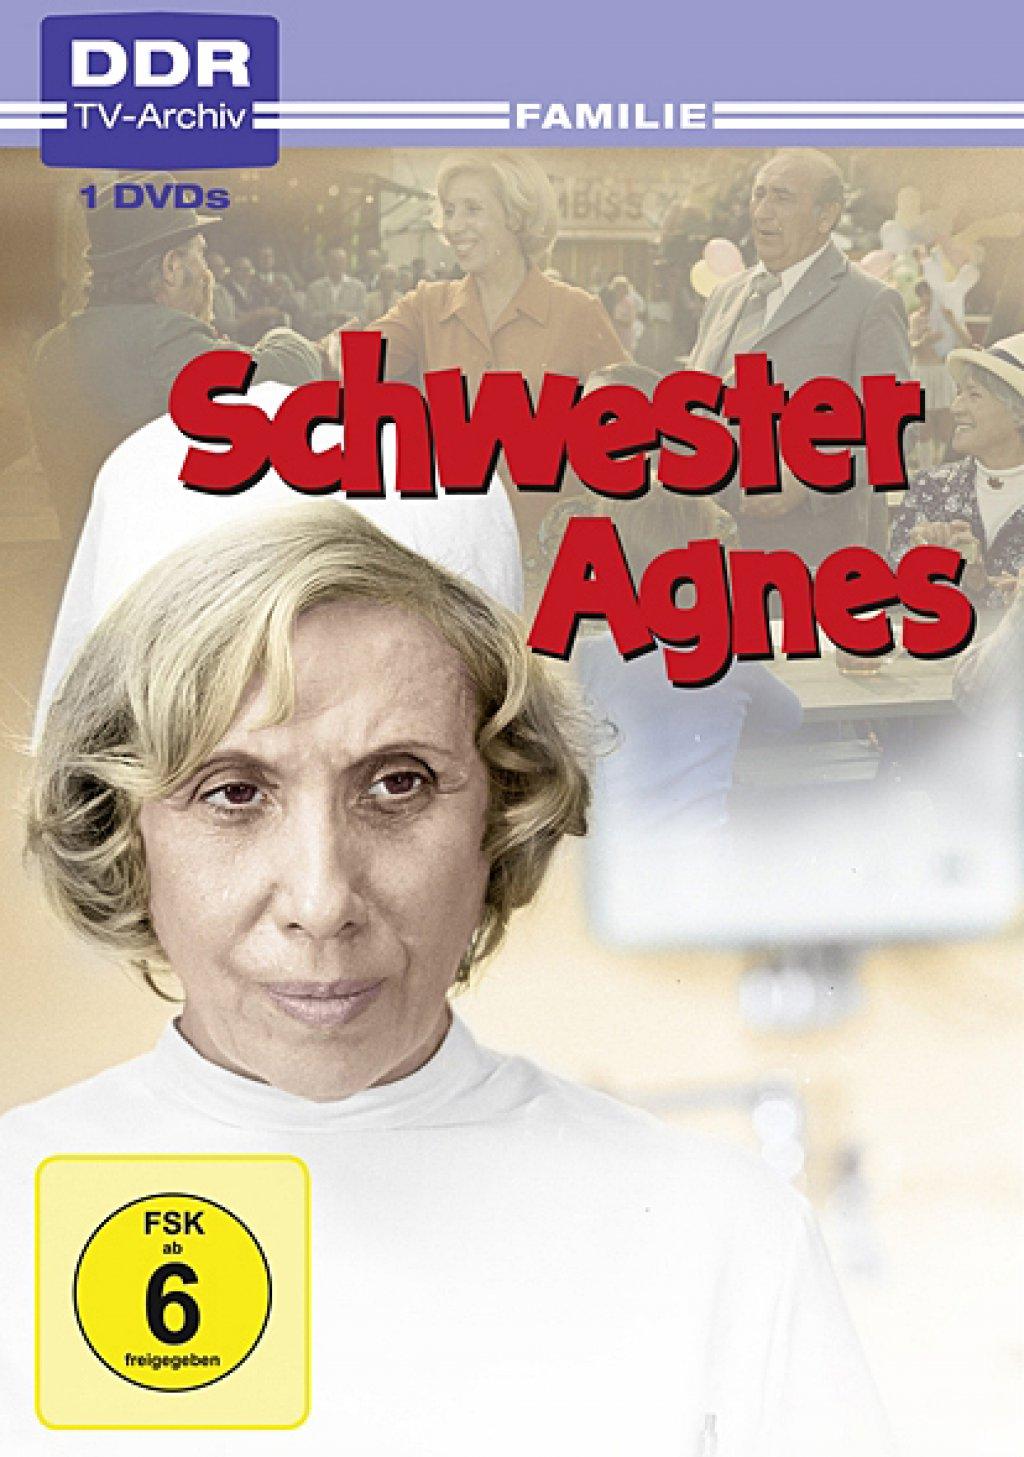 Schwester Agnes - DDR TV-Archiv (DVD)